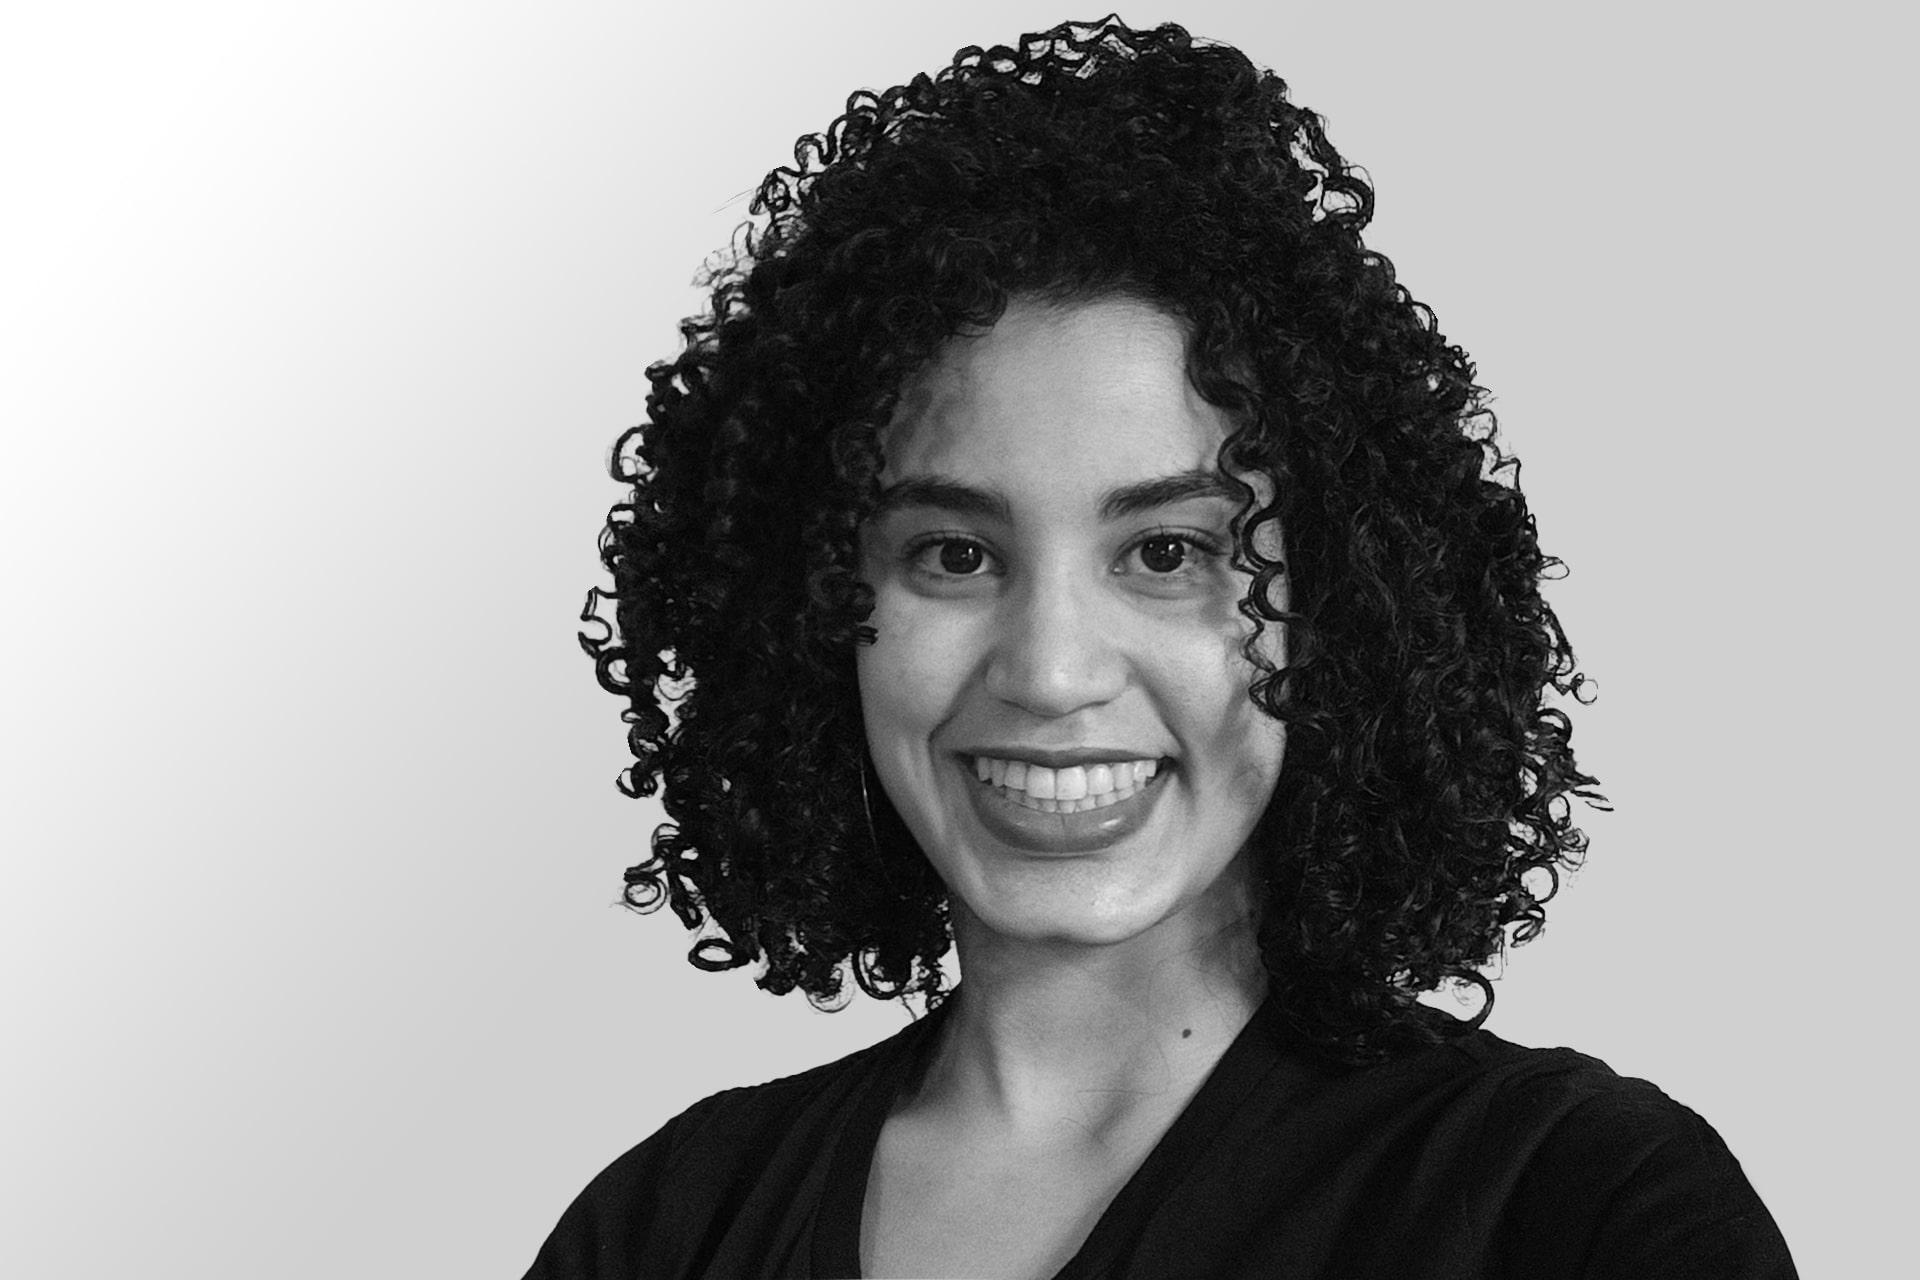 Barbara_Souza